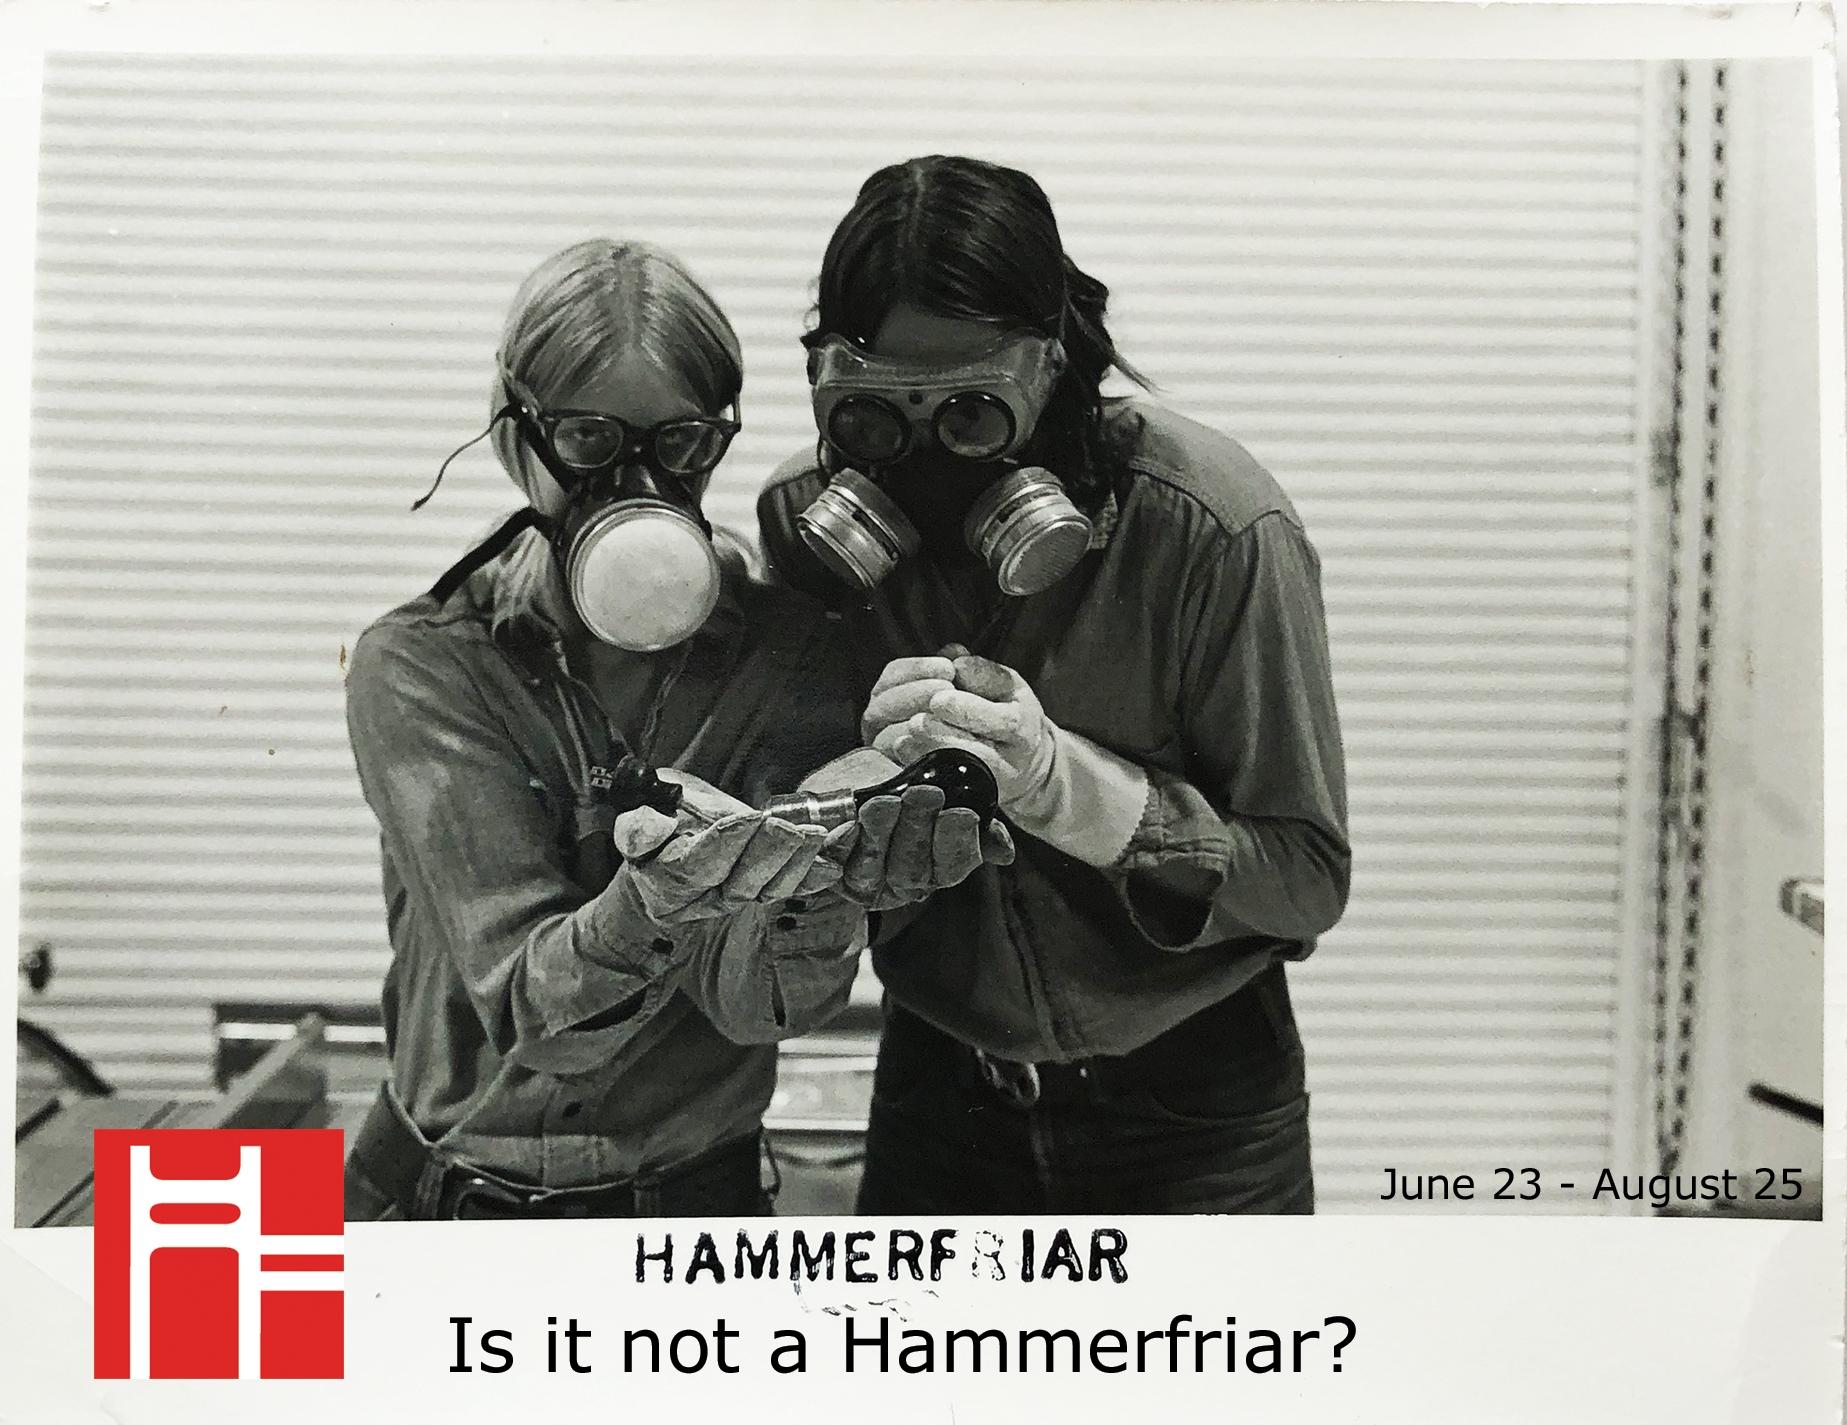 Hammerfriar Gallery in Healdsburg, Sonoma County, California